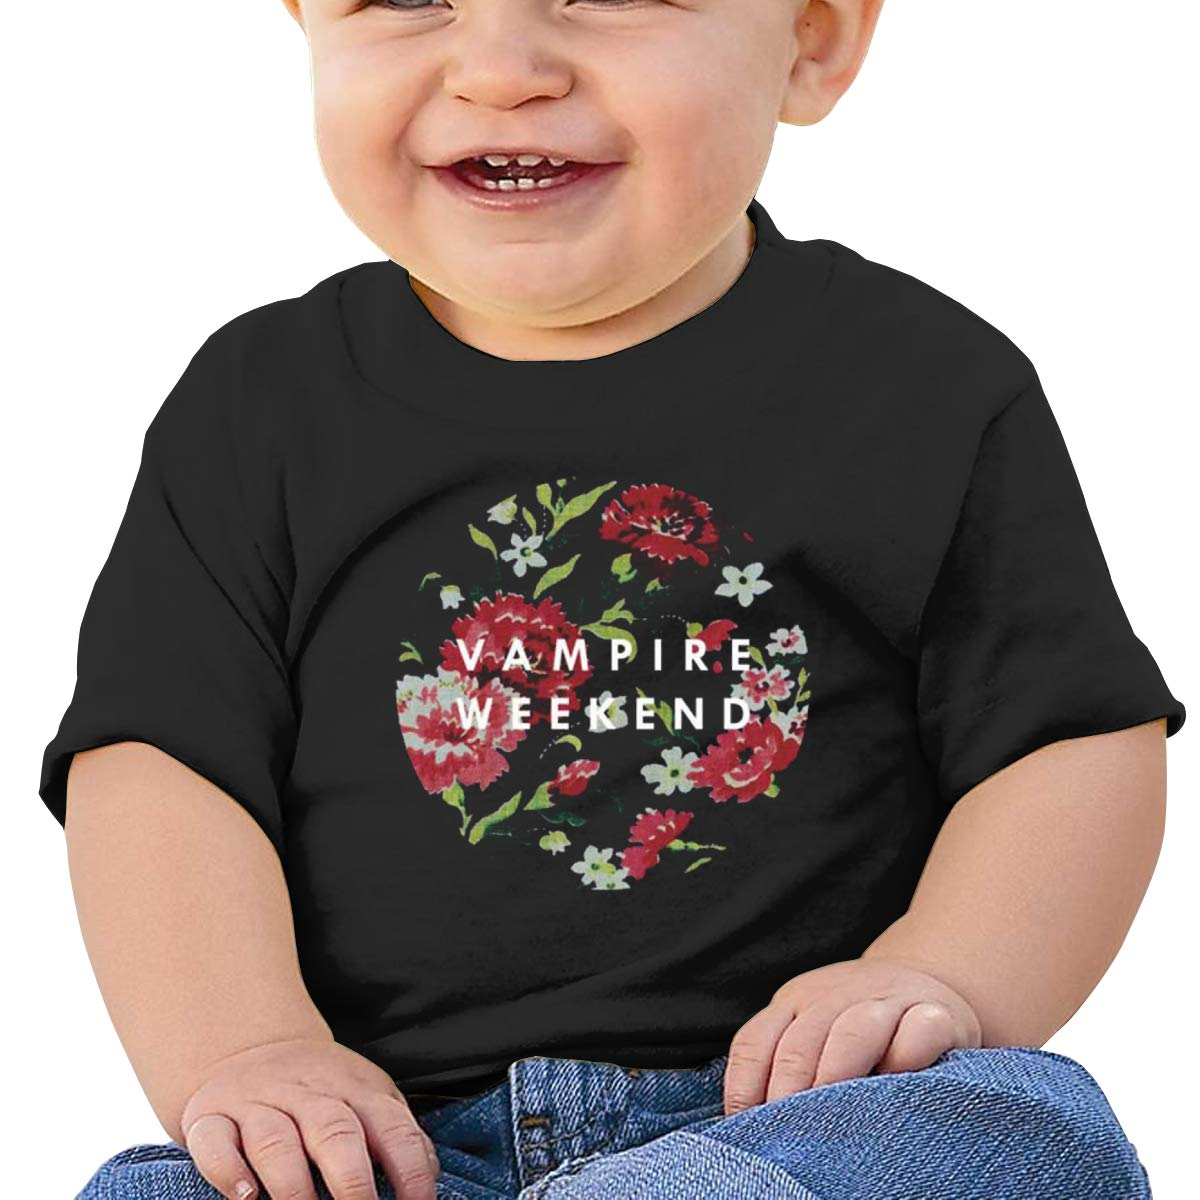 MONIKAL Unisex Infant Short Sleeve T-Shirt Vampire-Weekend Toddler Kids Organic Cotton Graphic Tee Tops